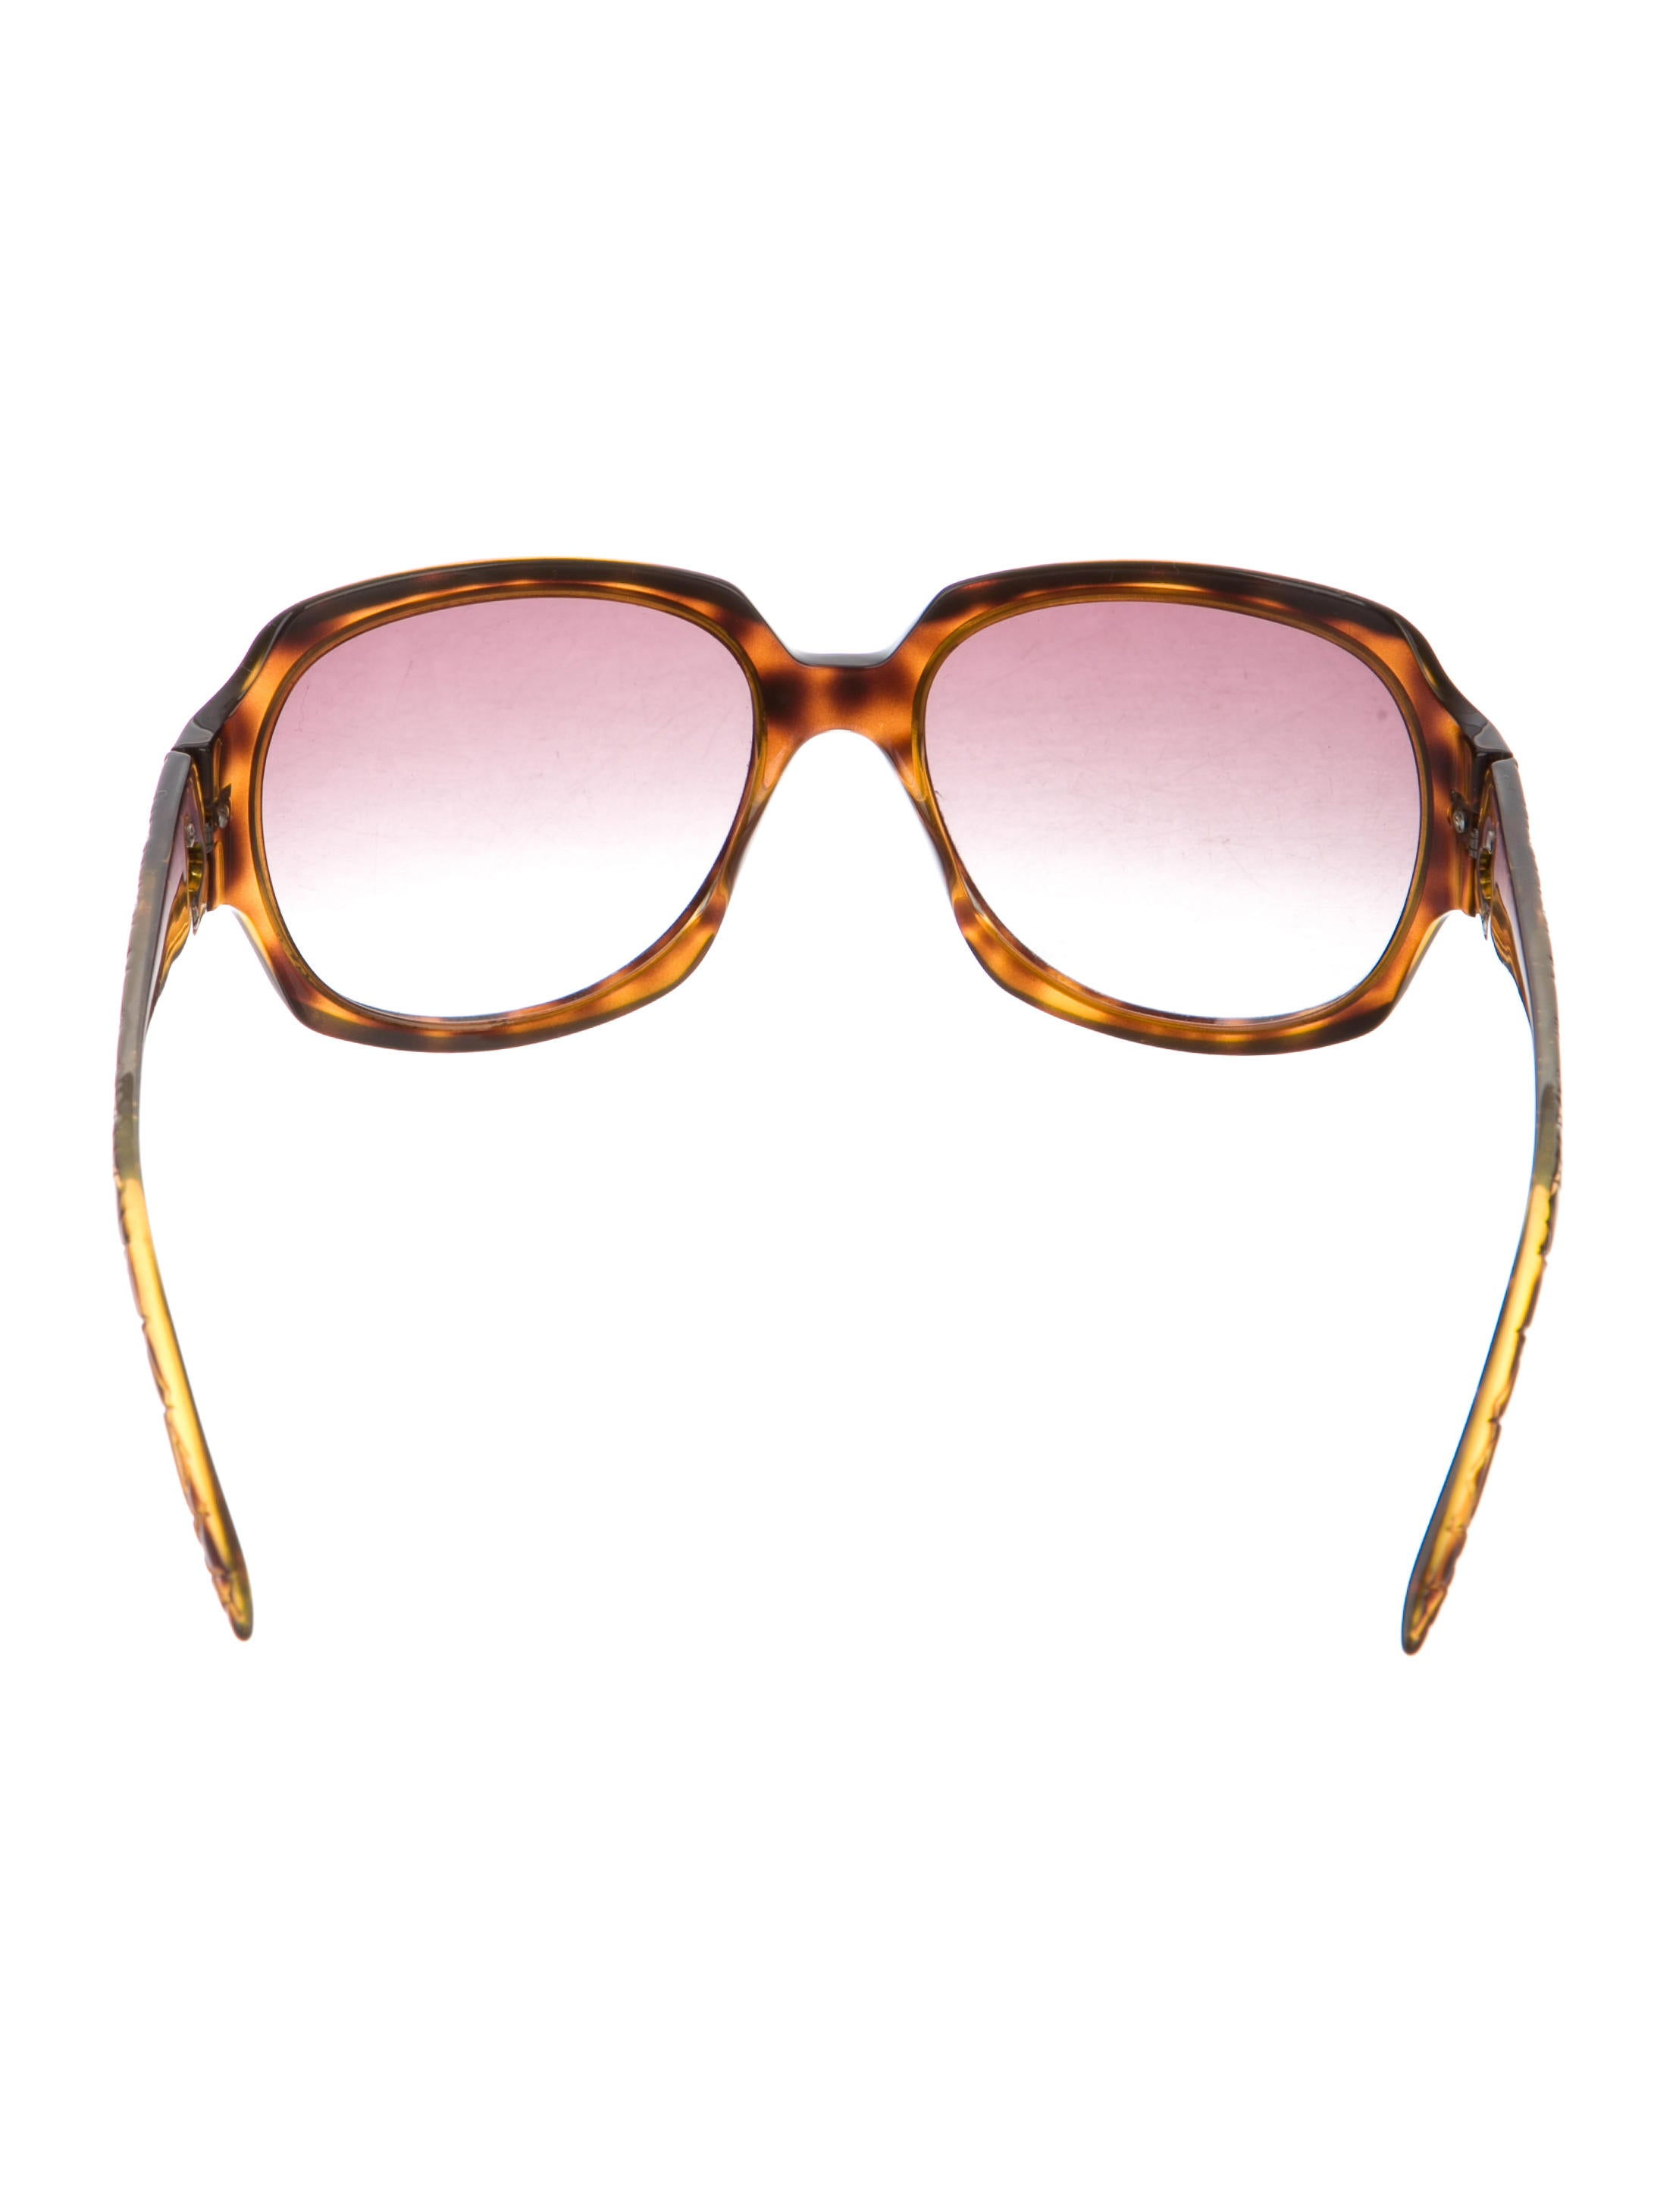 7acd3d107a5 Christian Dior My Lady Sunglasses